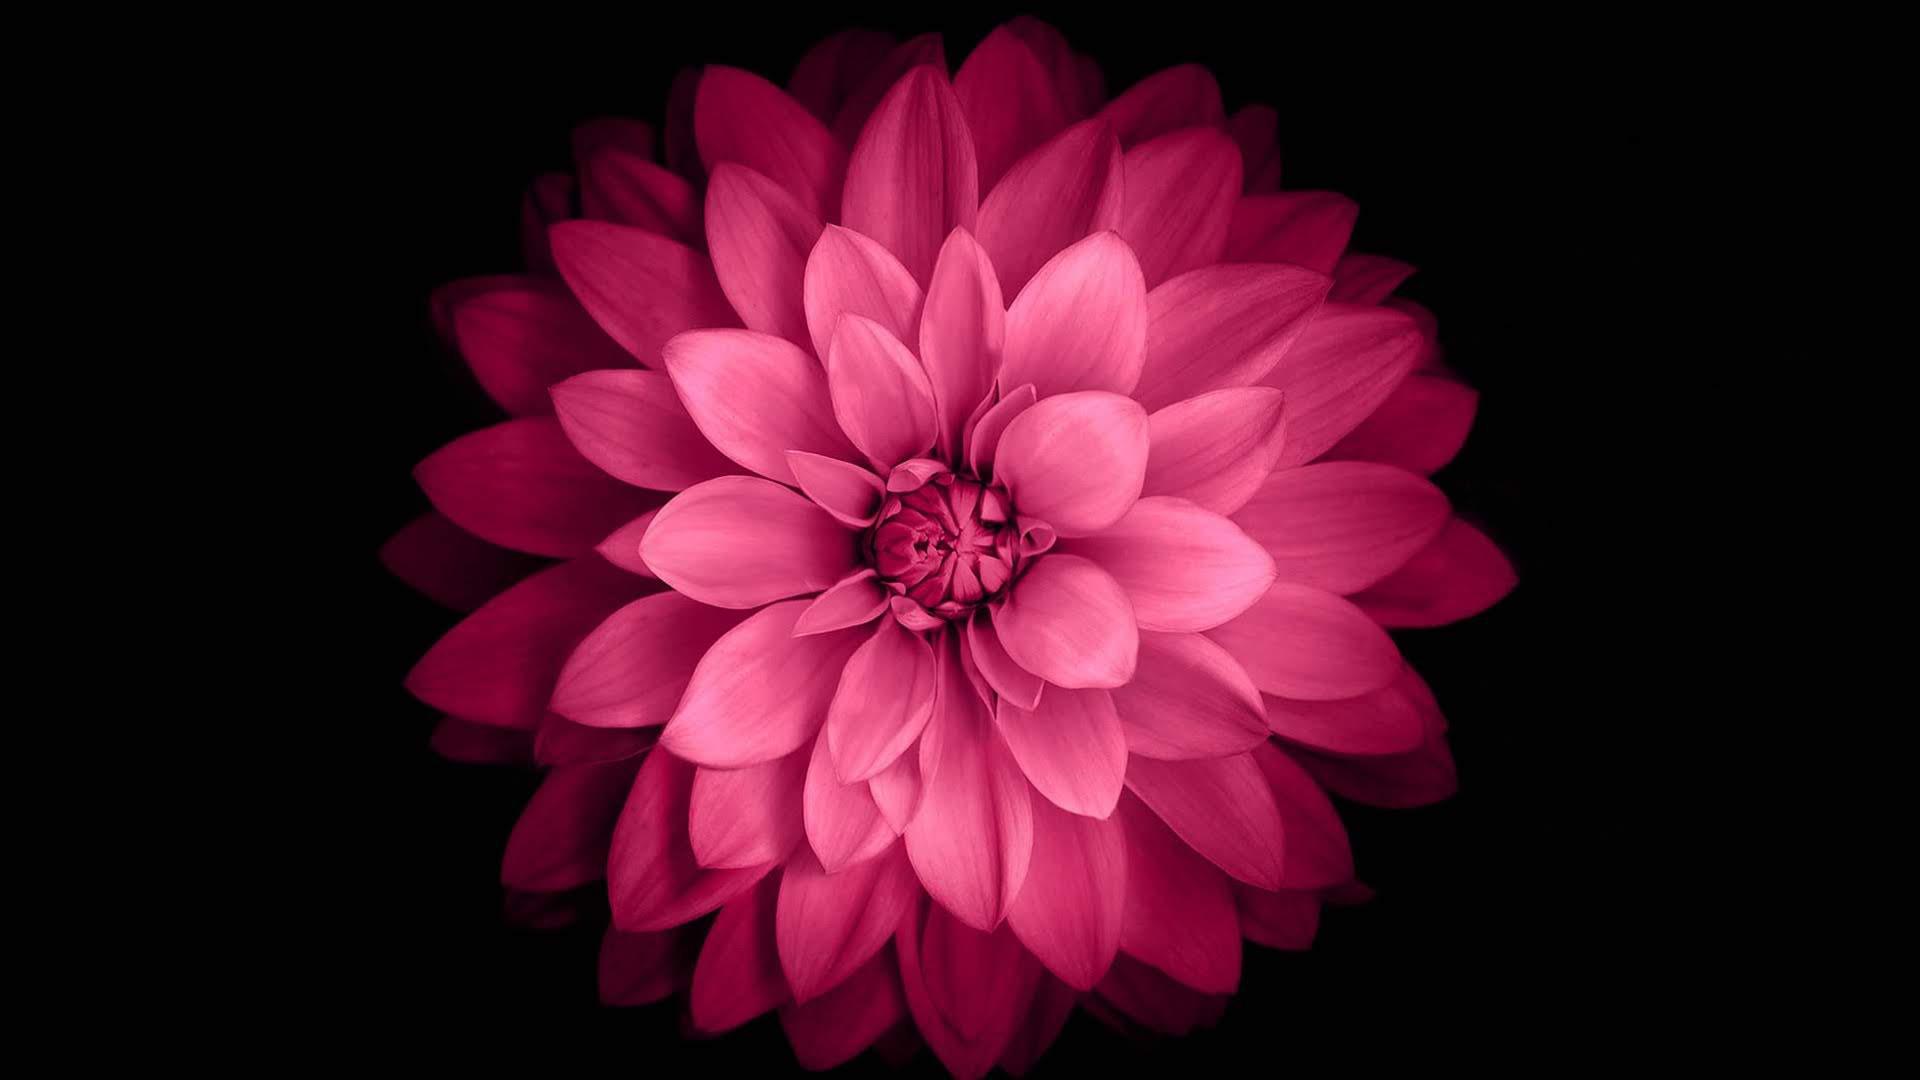 Pink Flower Black Background - 1920x1080 - Download HD ...